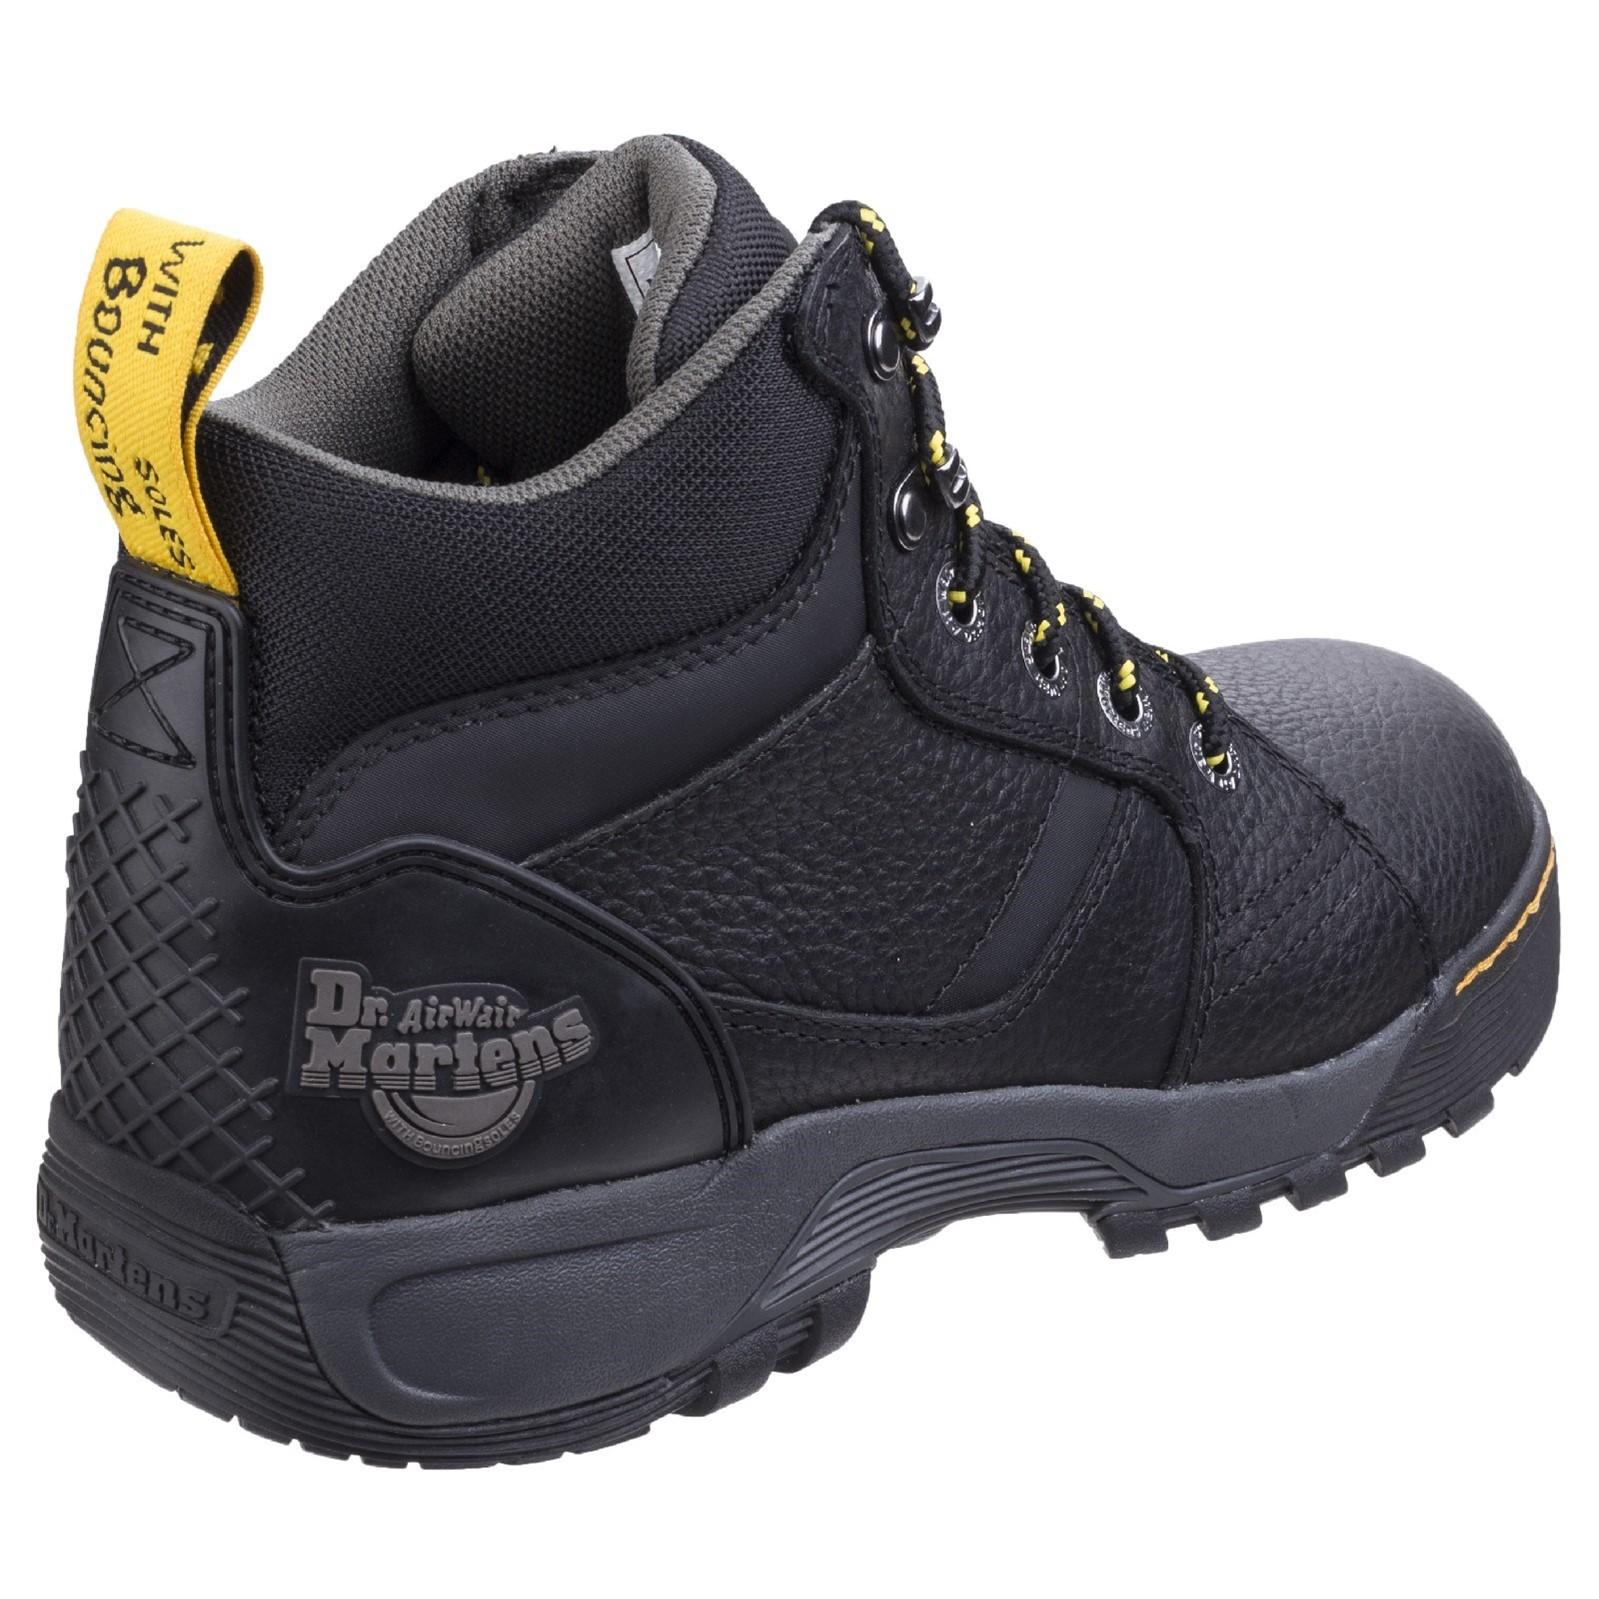 41d2c1d31dc Details about Dr. Martens Grapple - Mens/Womens Safety Boots - Steel Toe SB